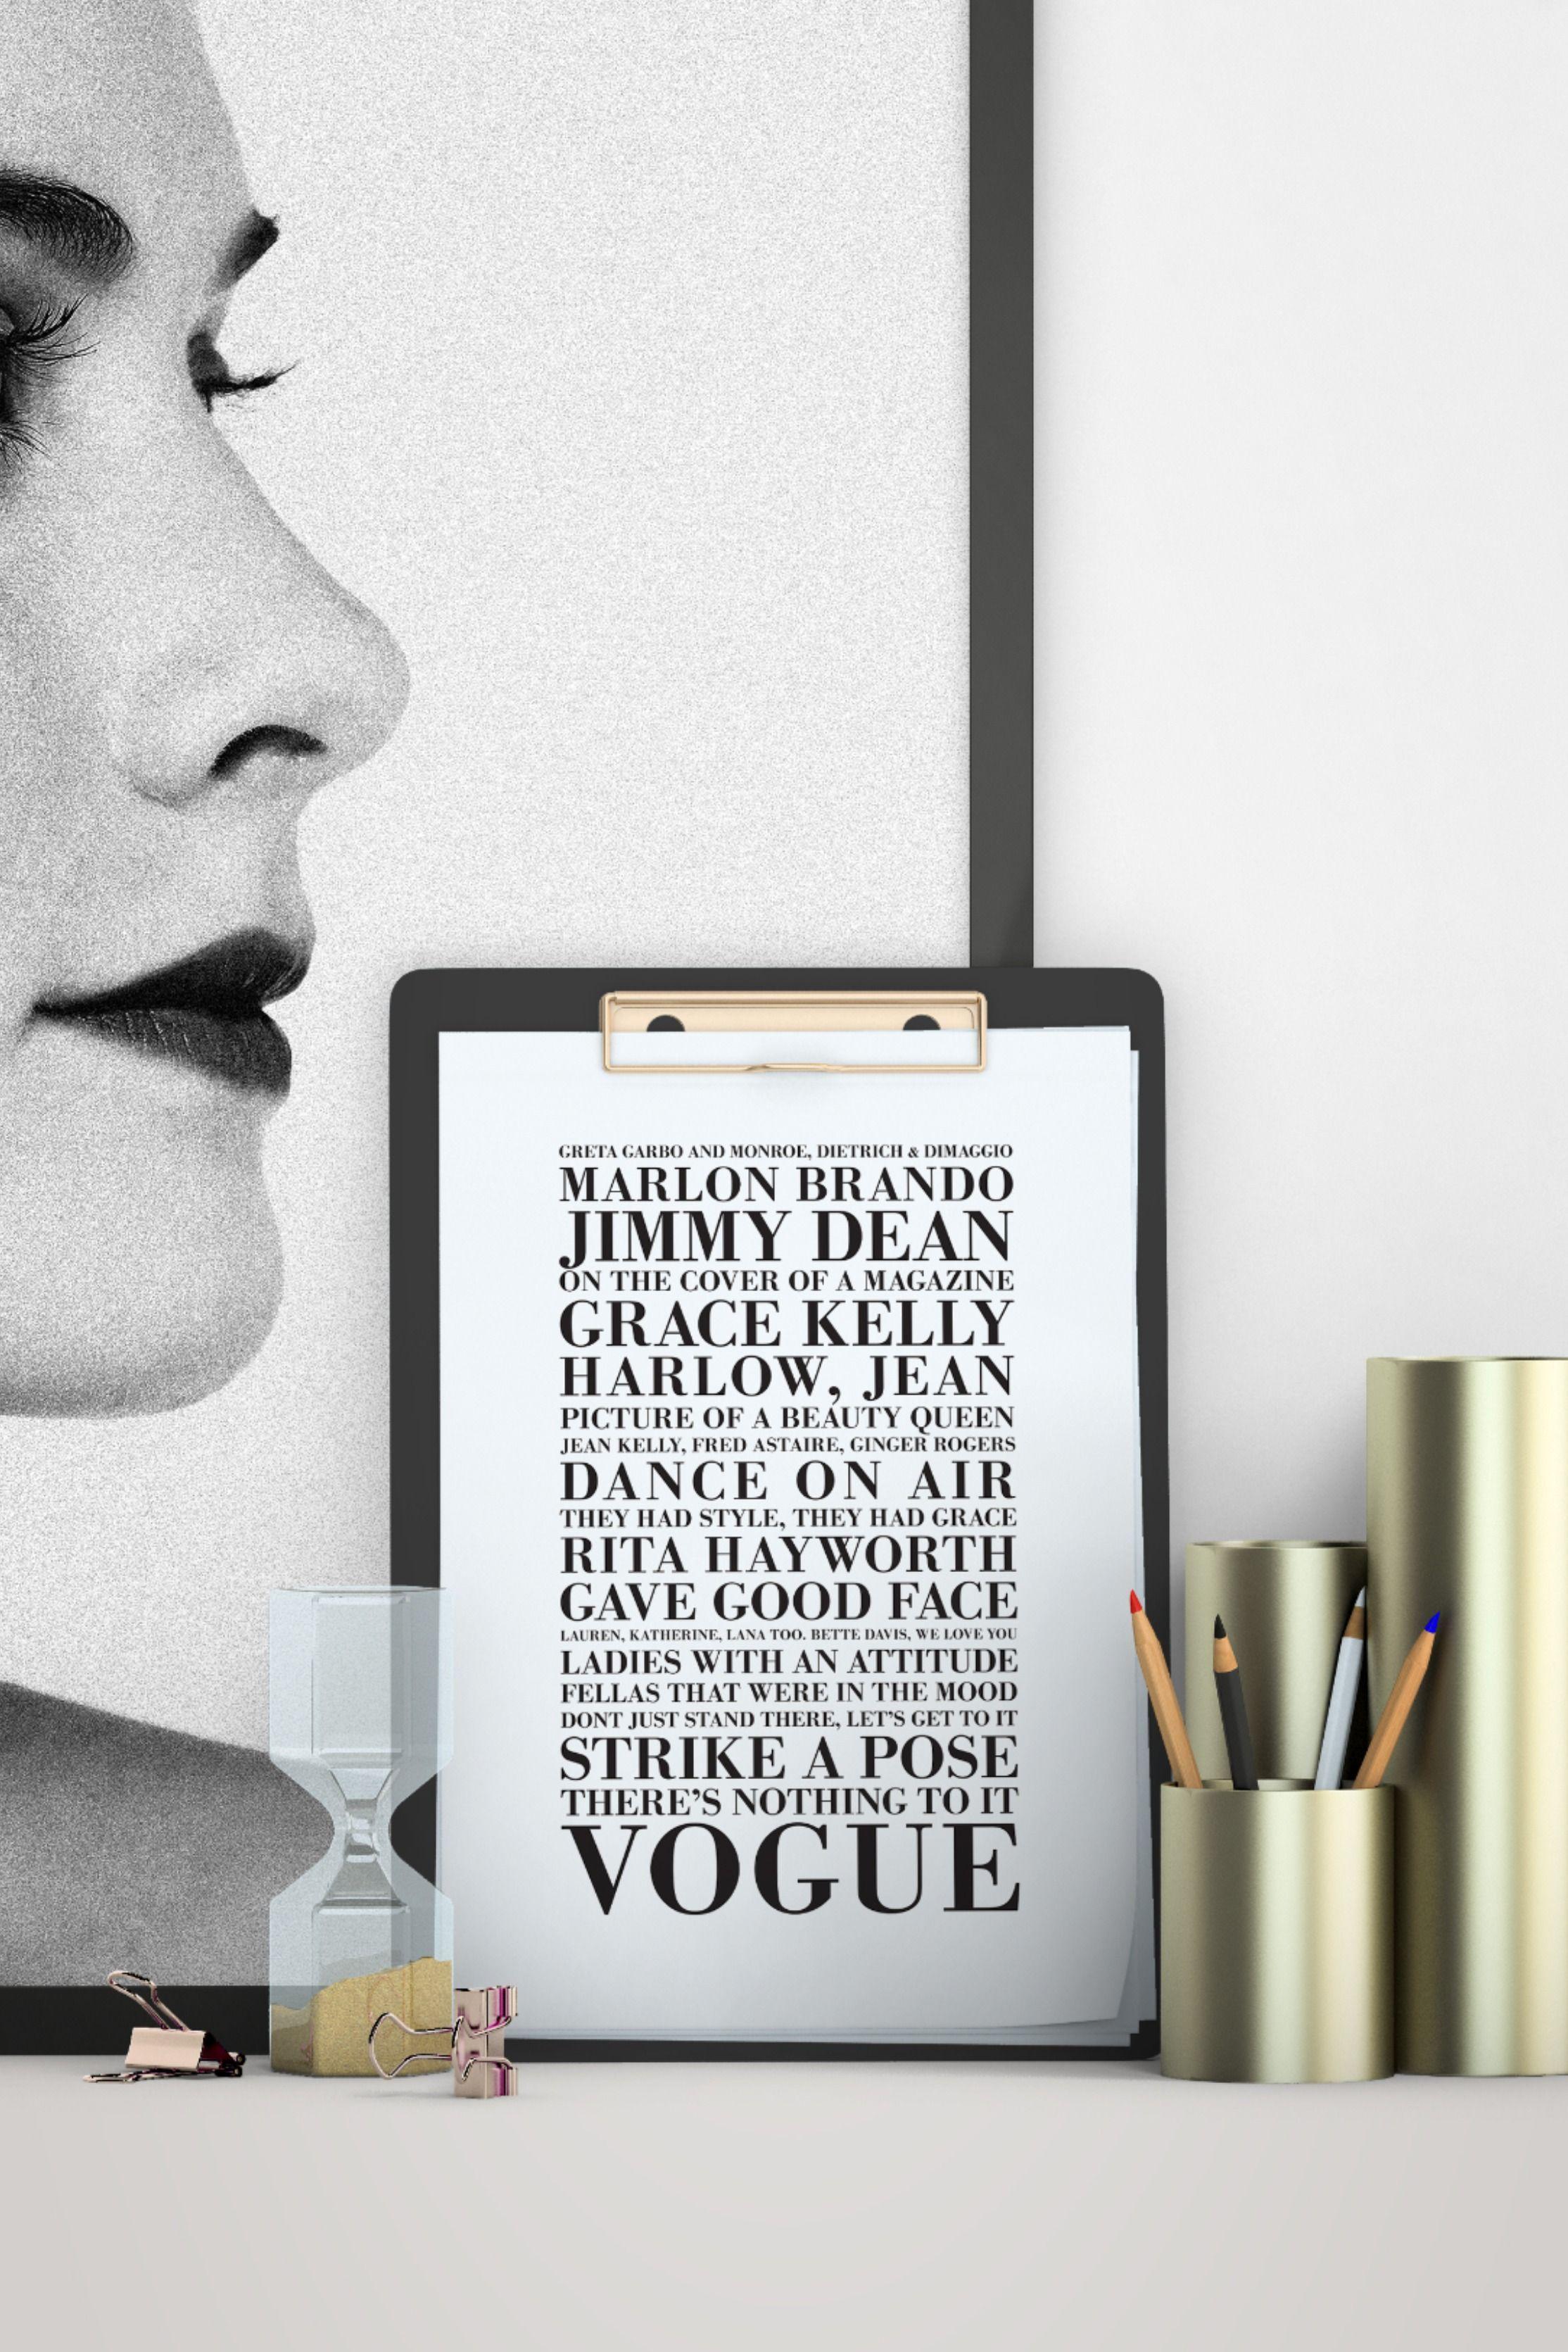 Vogue Lyrics, Madonna   Digital files, Madonna, Digital